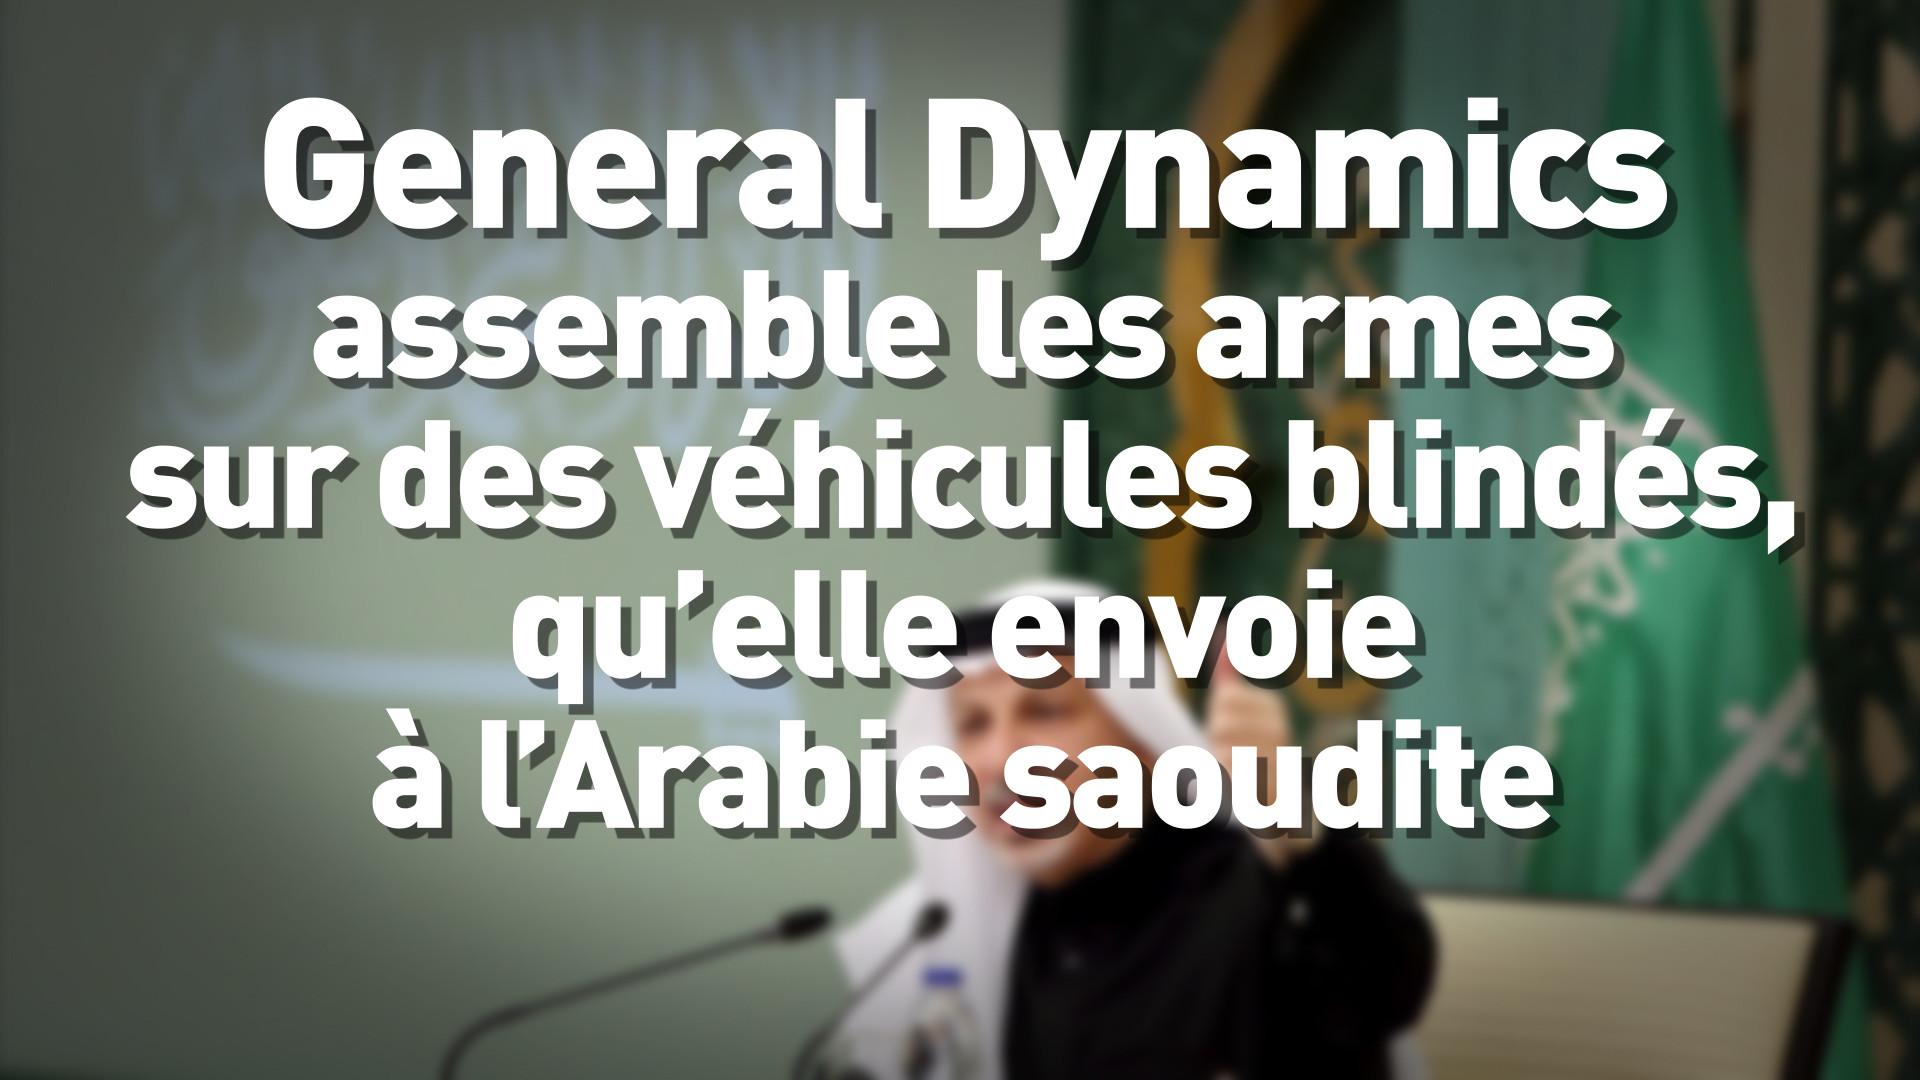 Made in Belgium : 84% des armes de Wallonie vendues à l'Arabie saoudite en 2014